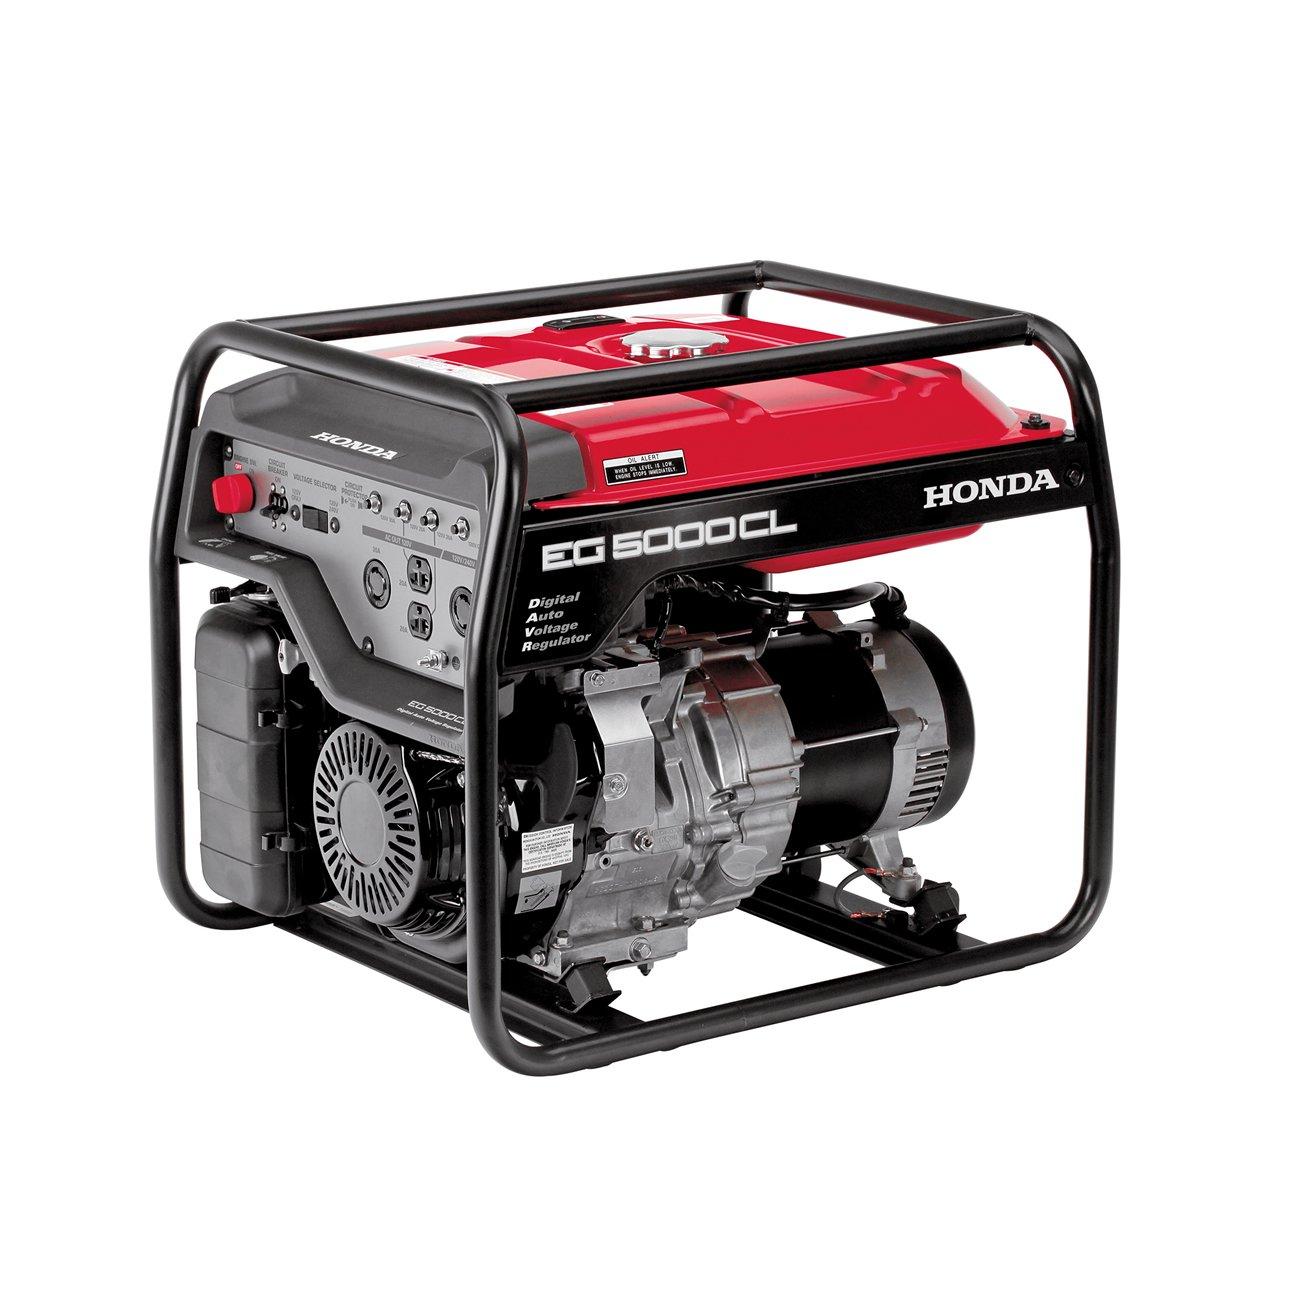 Get Quotations · HONDA EG5000 Economy Generator, 4500W